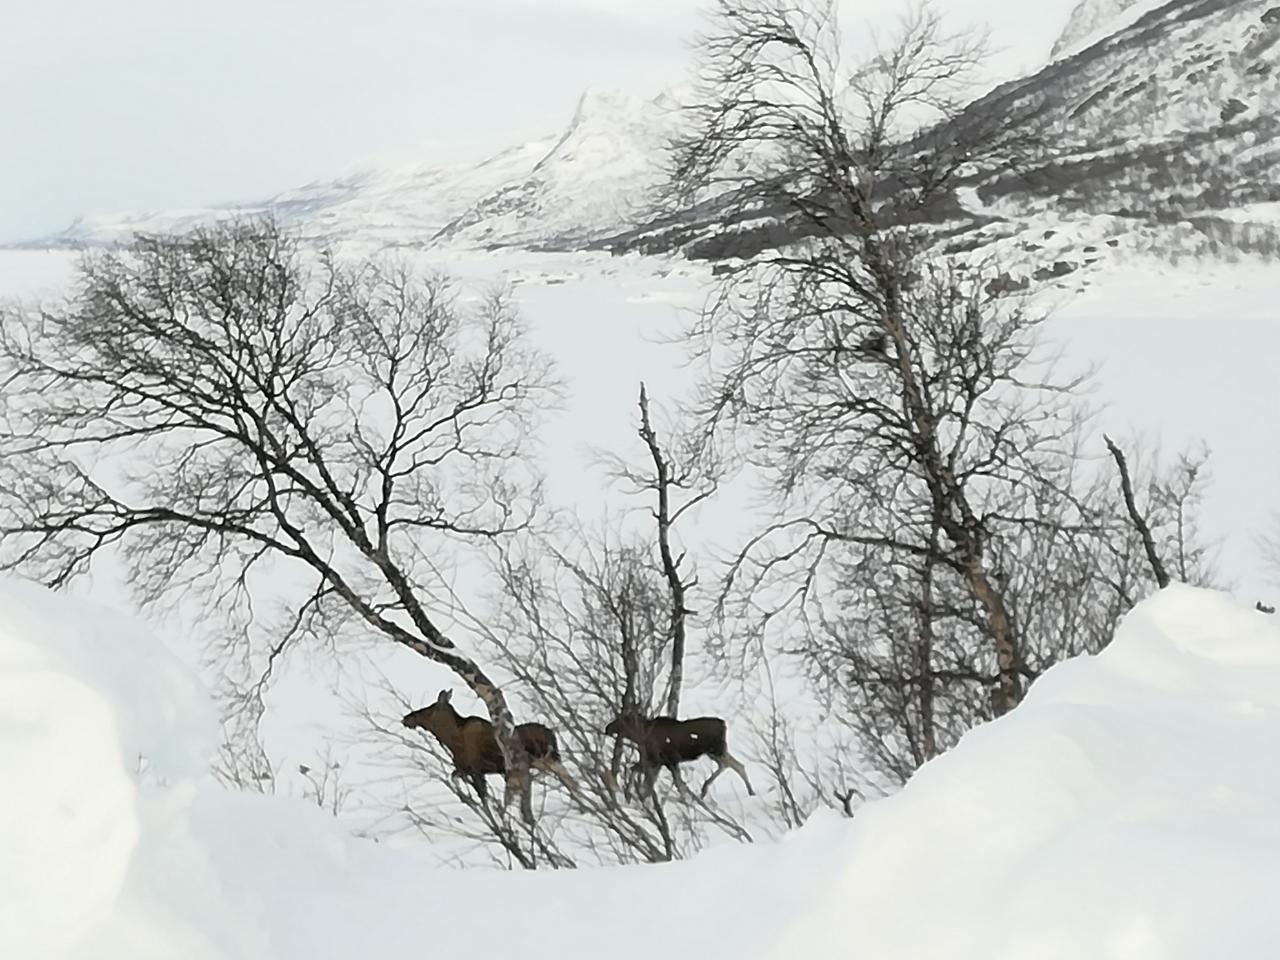 Elche Lappland Stora Sjöfallet